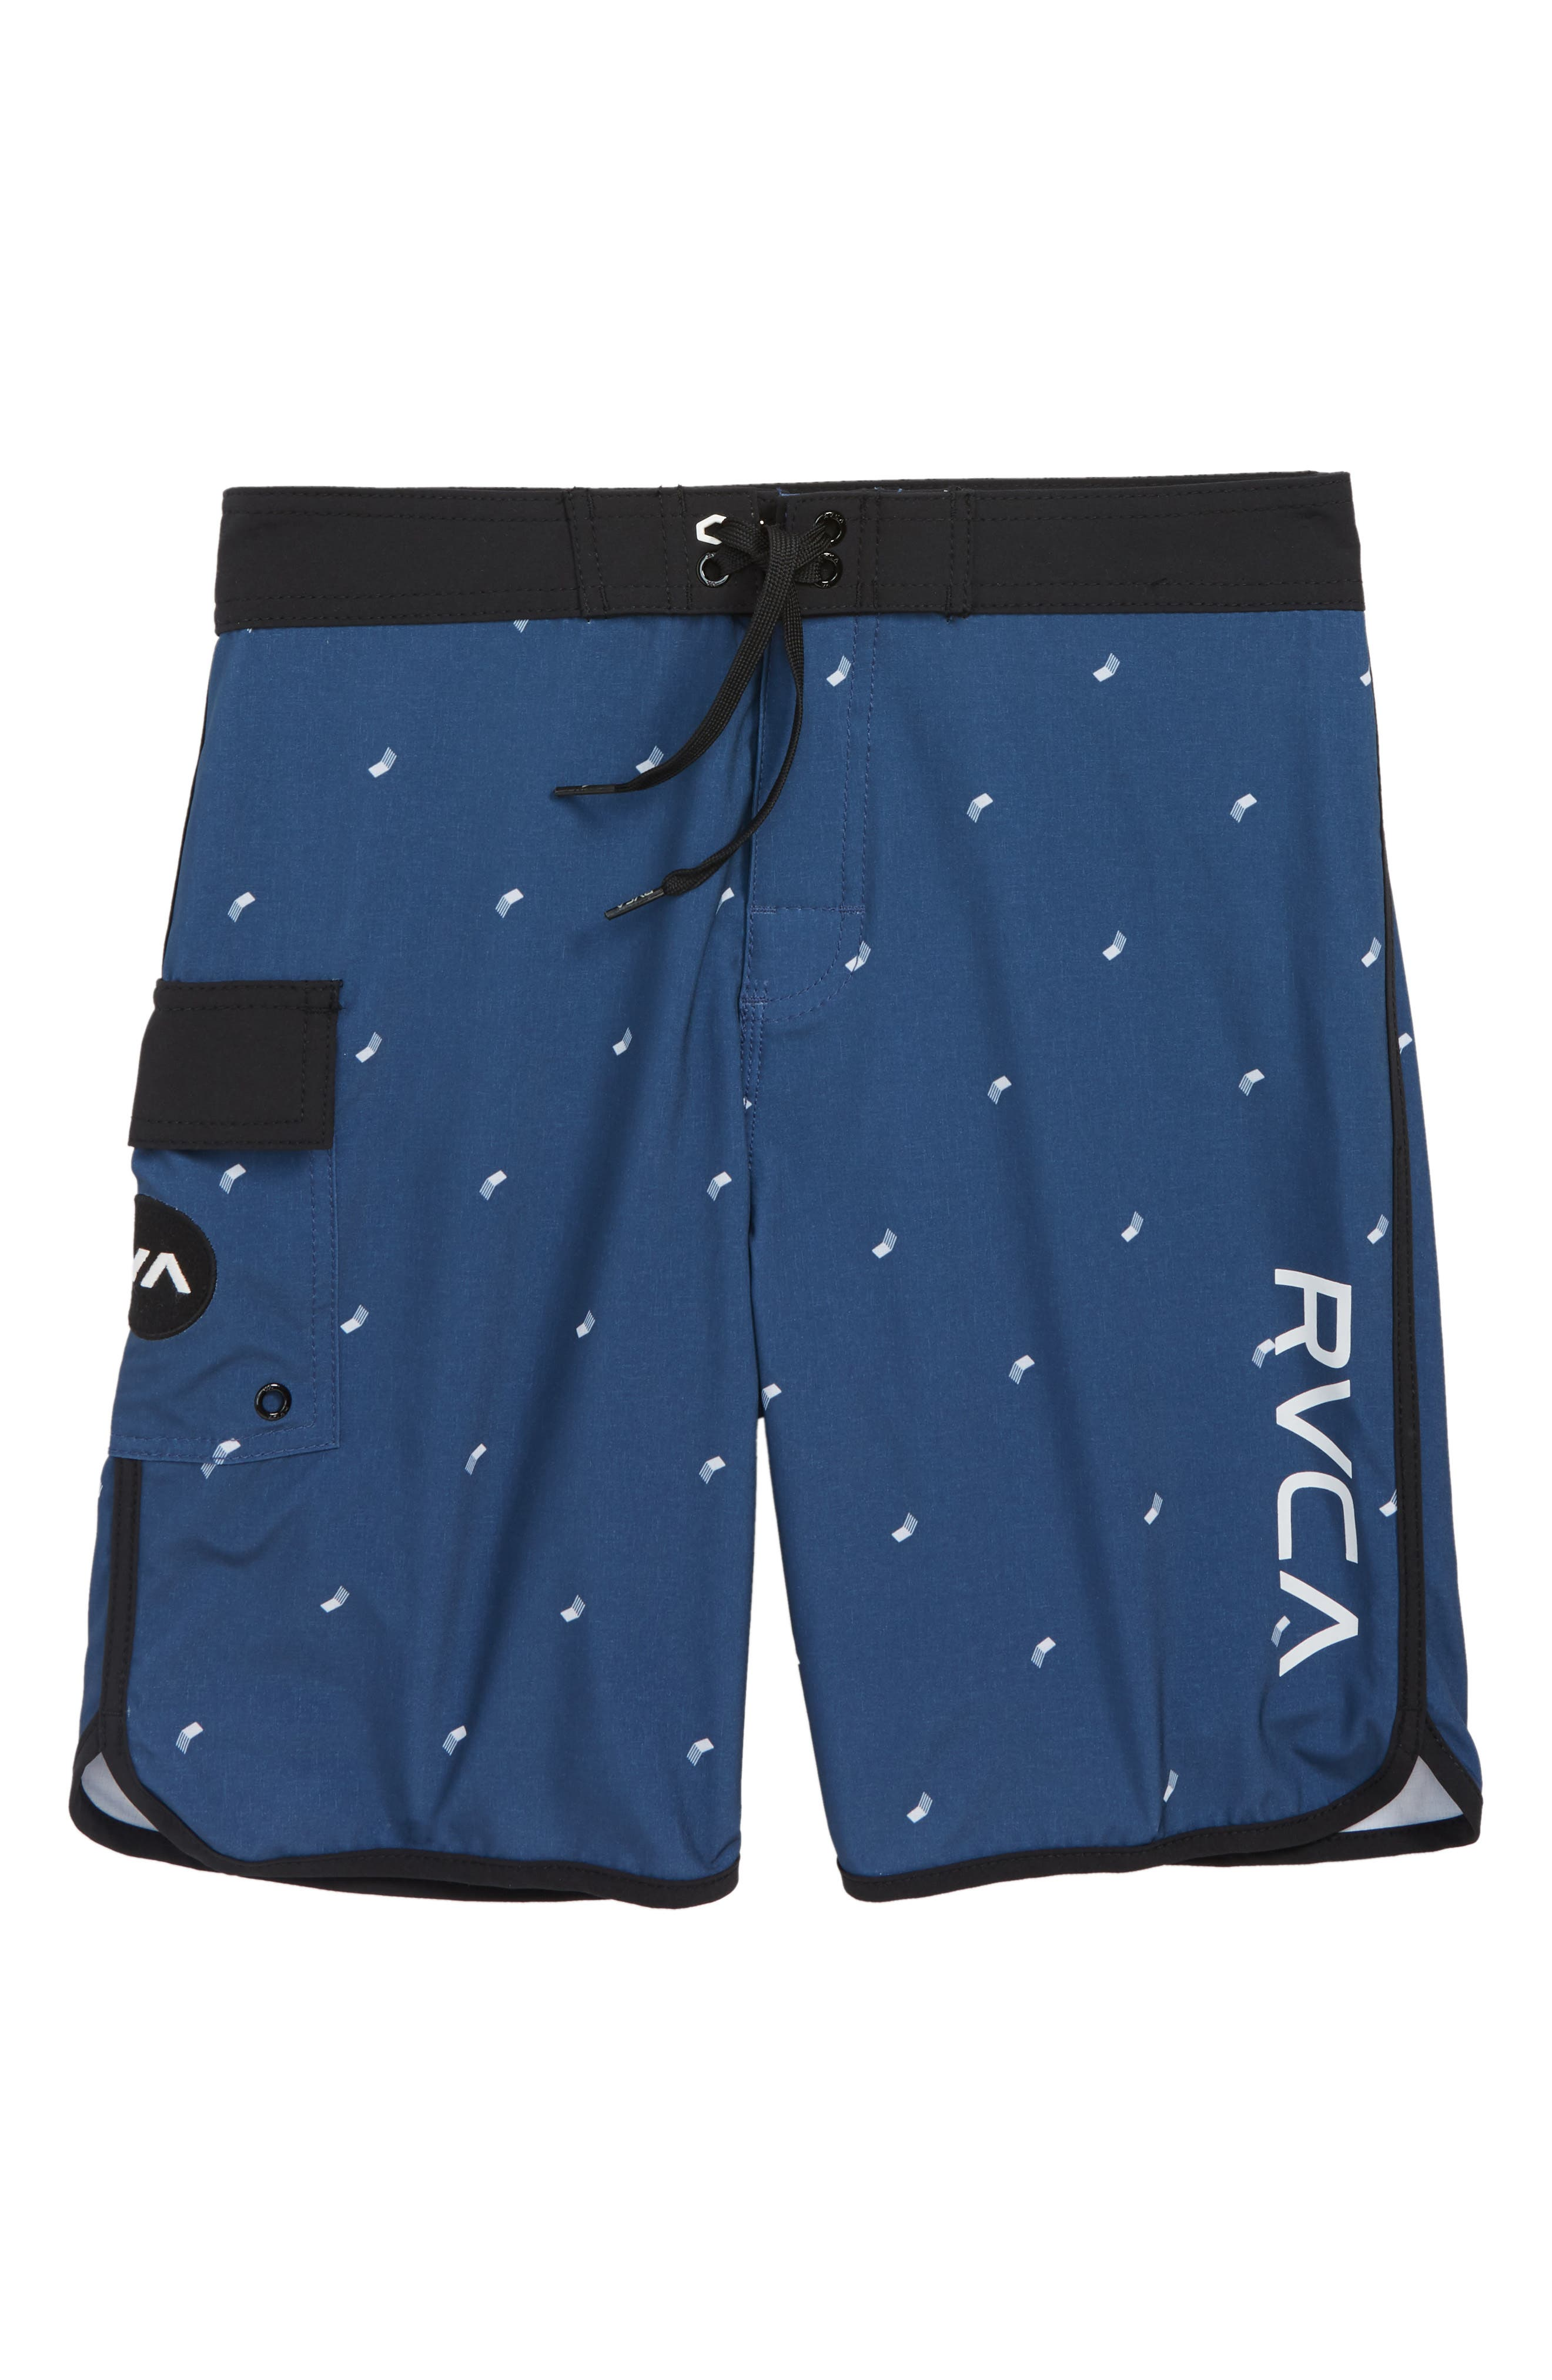 'Eastern' Scalloped Hem Board Shorts,                         Main,                         color, SEATTLE BLUE